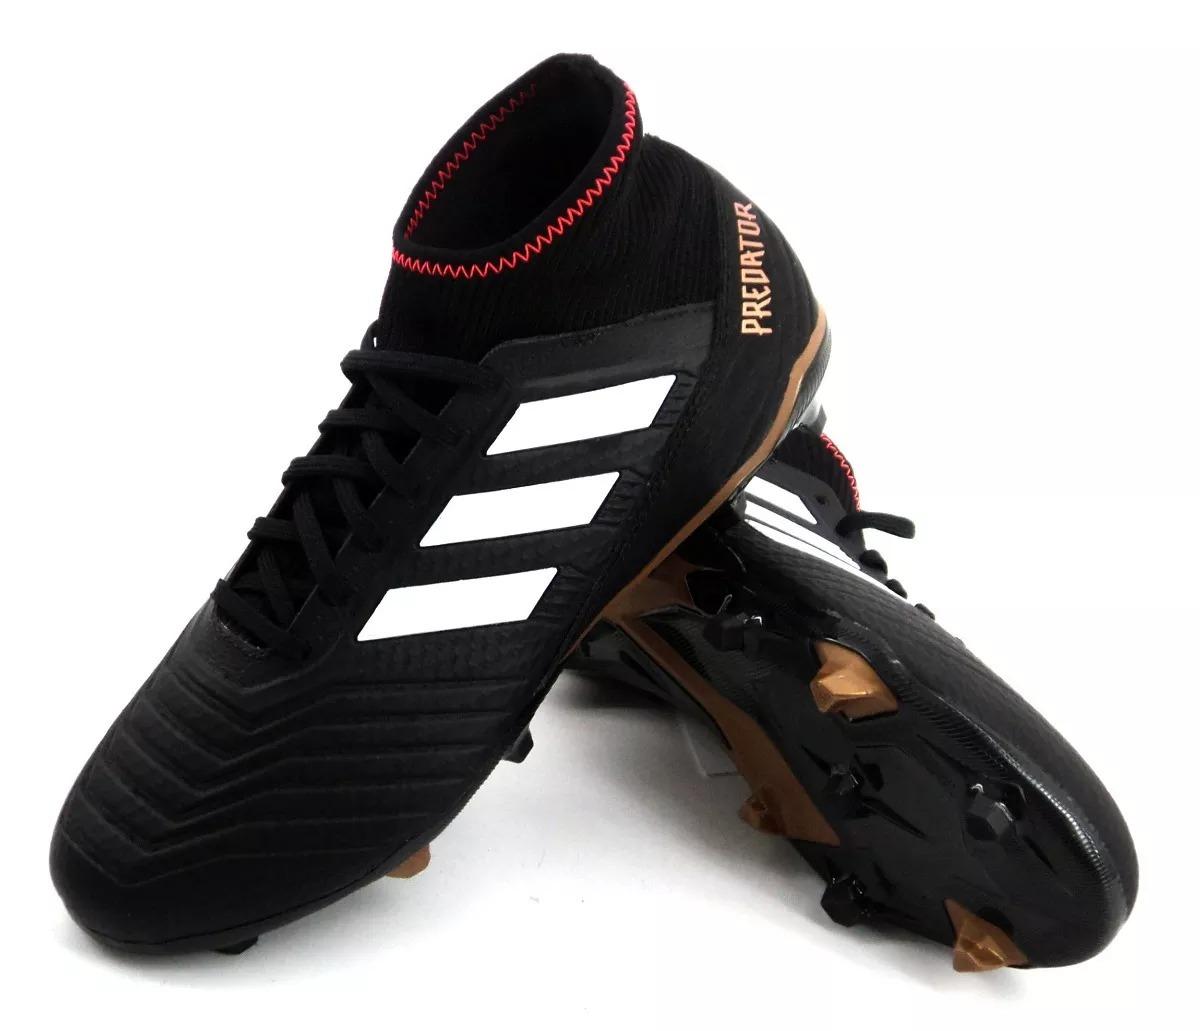 637191221 botin adidas predator 18.3 fg fútbol niño 9010 empo2000. Cargando zoom.